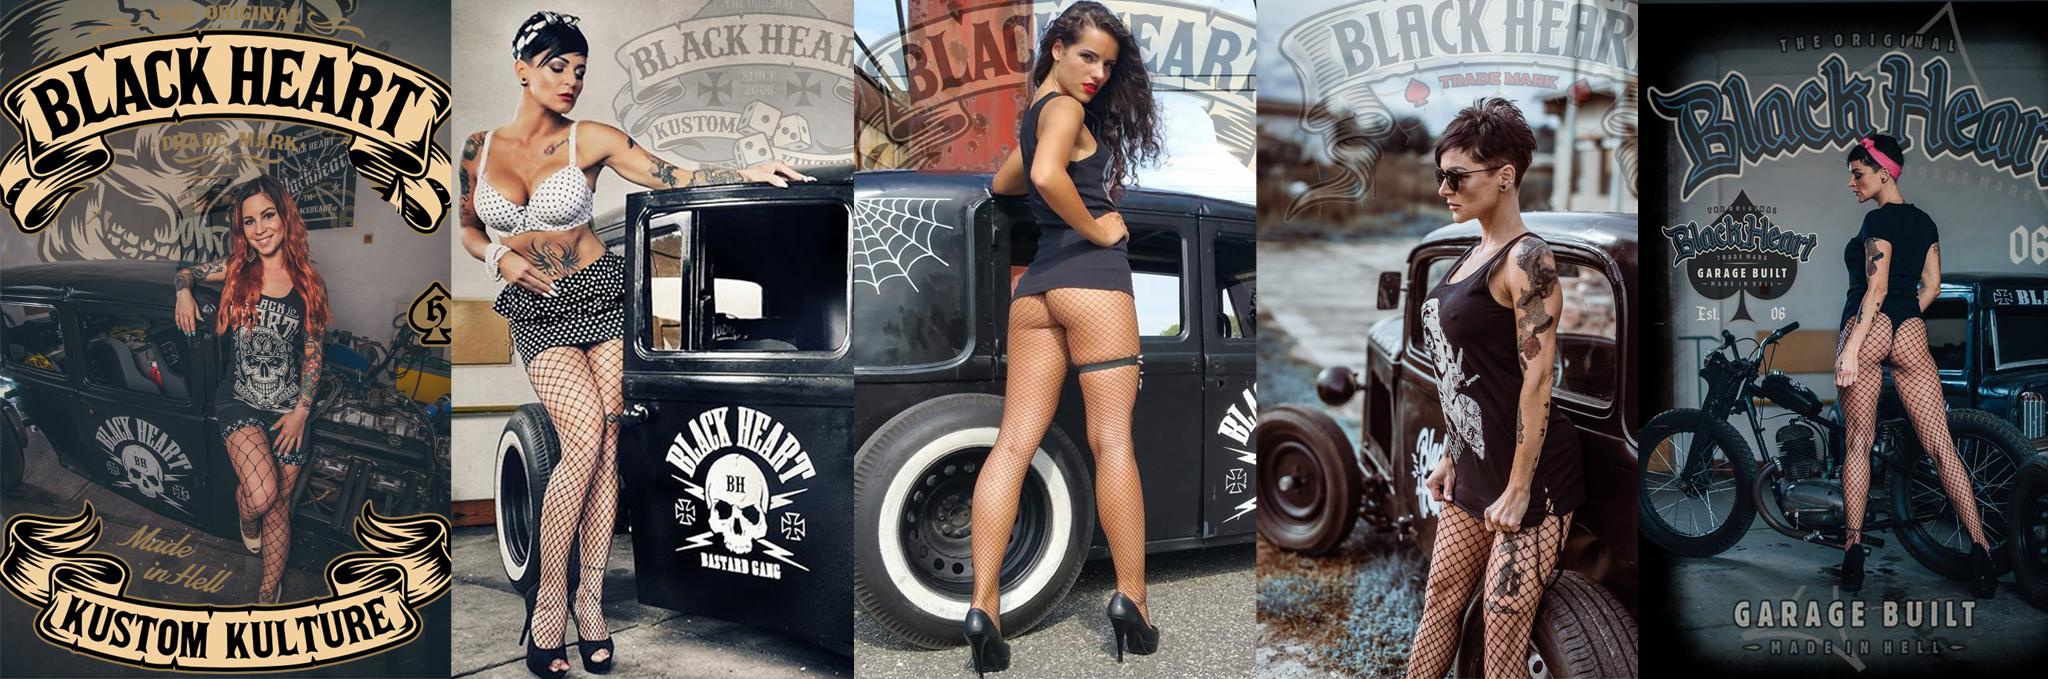 black heart hot rod chopper clothingjpg